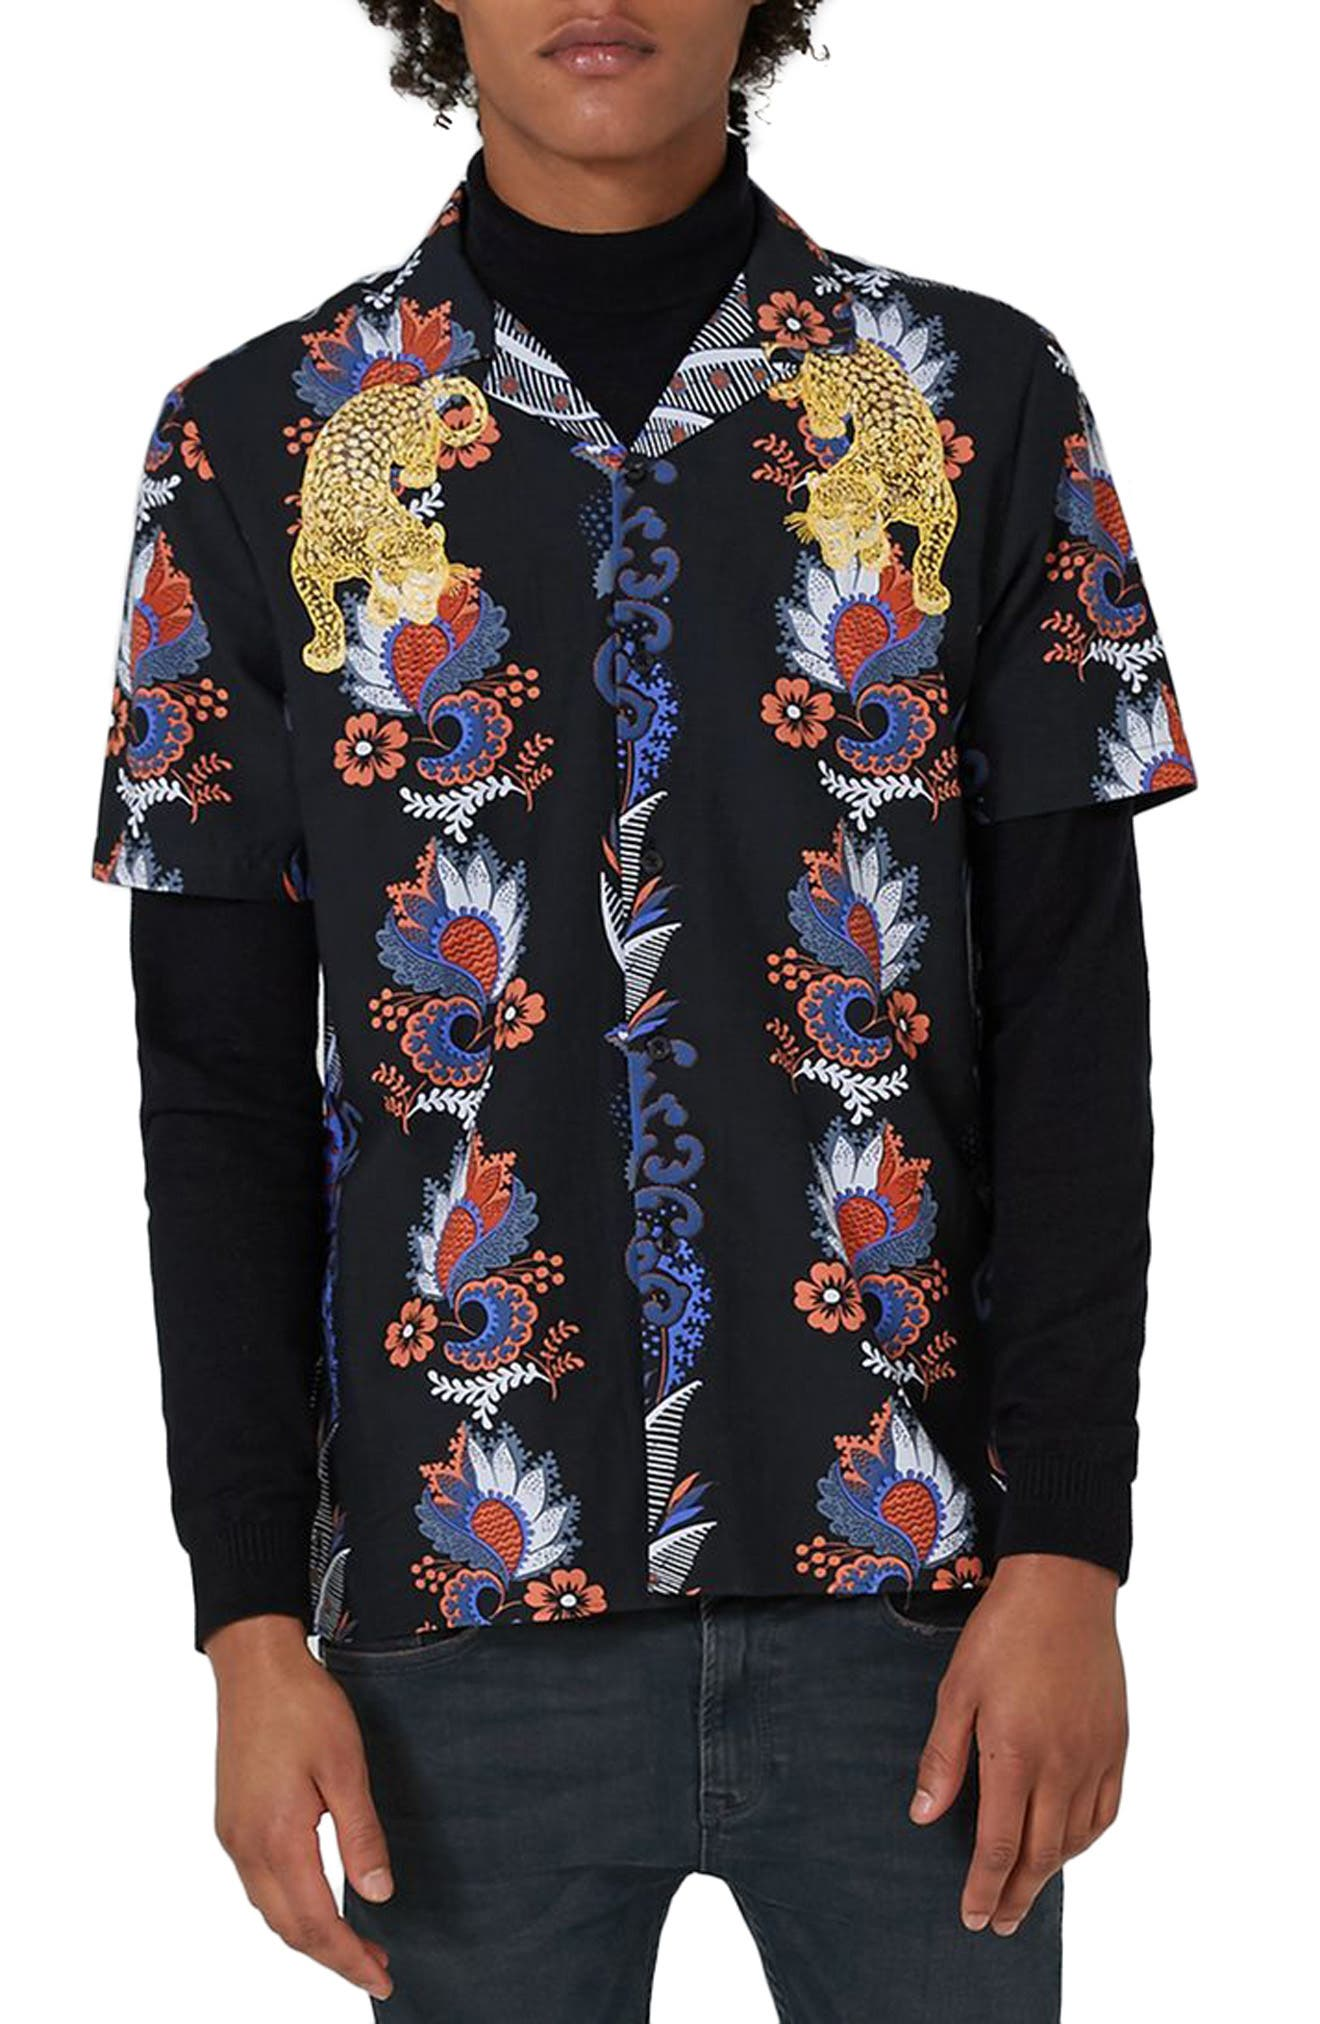 Embroidered Tiger Print Revere Collar Shirt,                             Main thumbnail 1, color,                             001